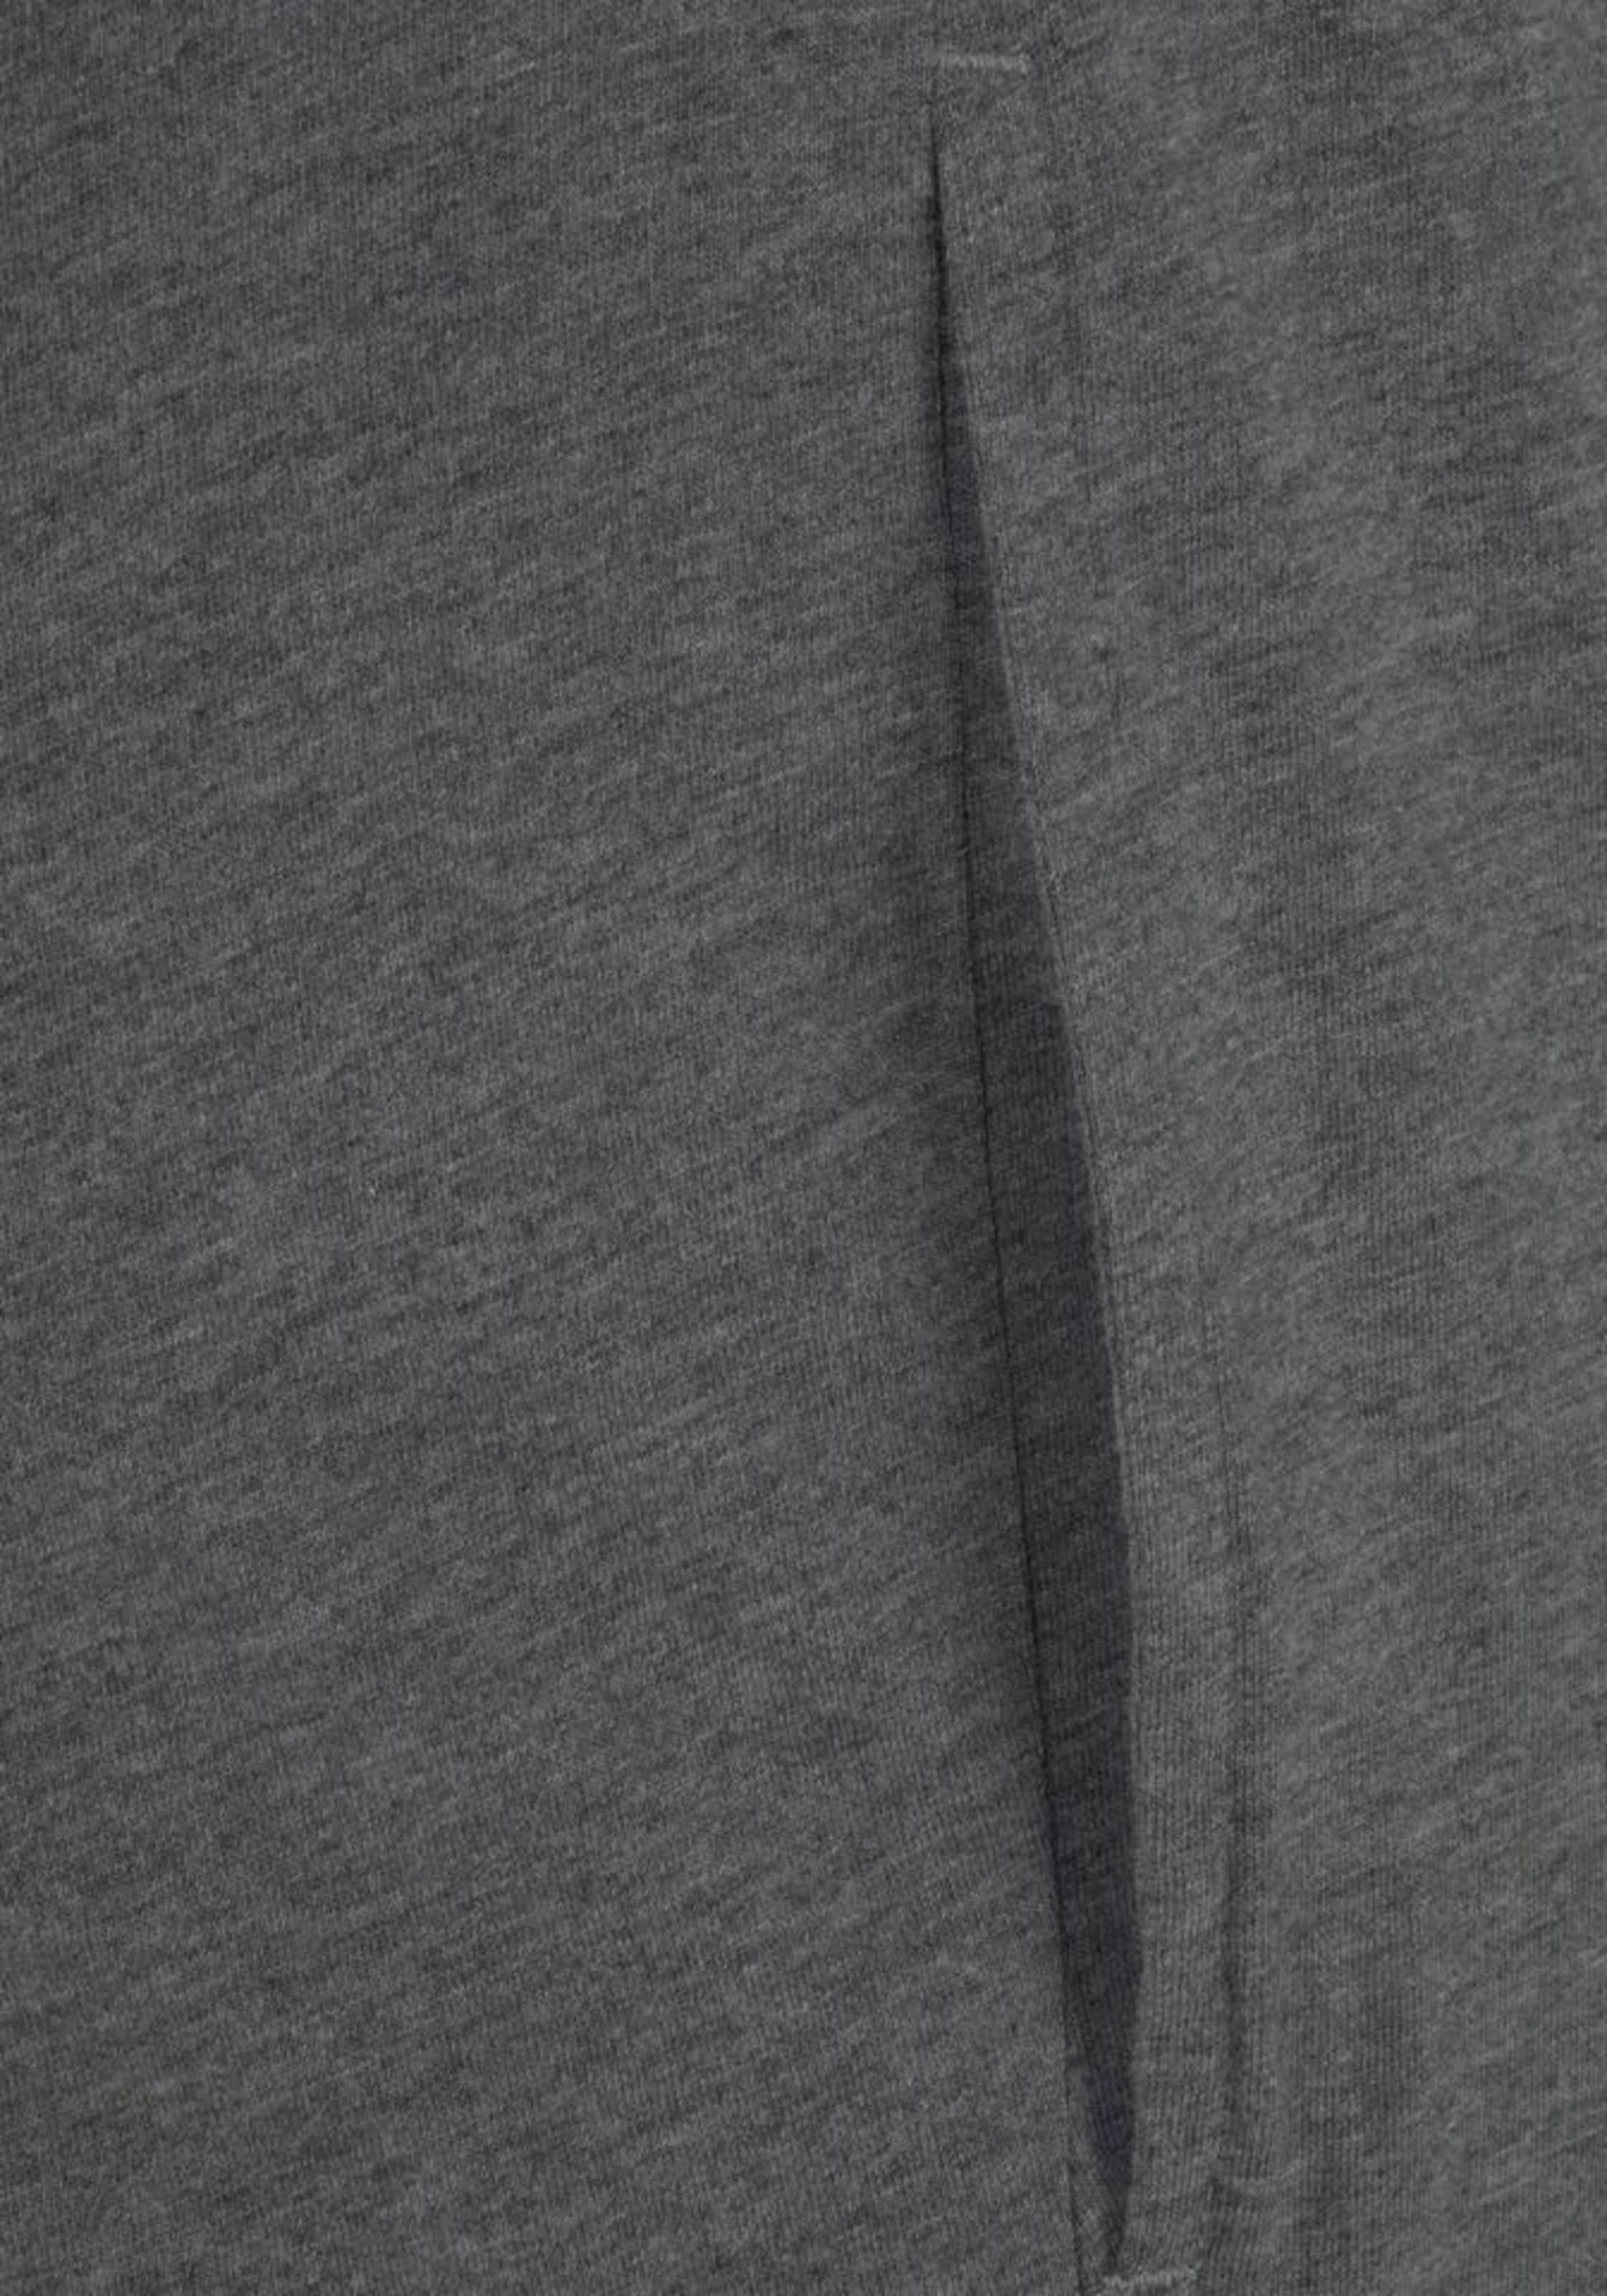 JOCKEY Pyjama Rabatt Bilder Erschwinglich Spielraum Besuch DXSWnoVAhj